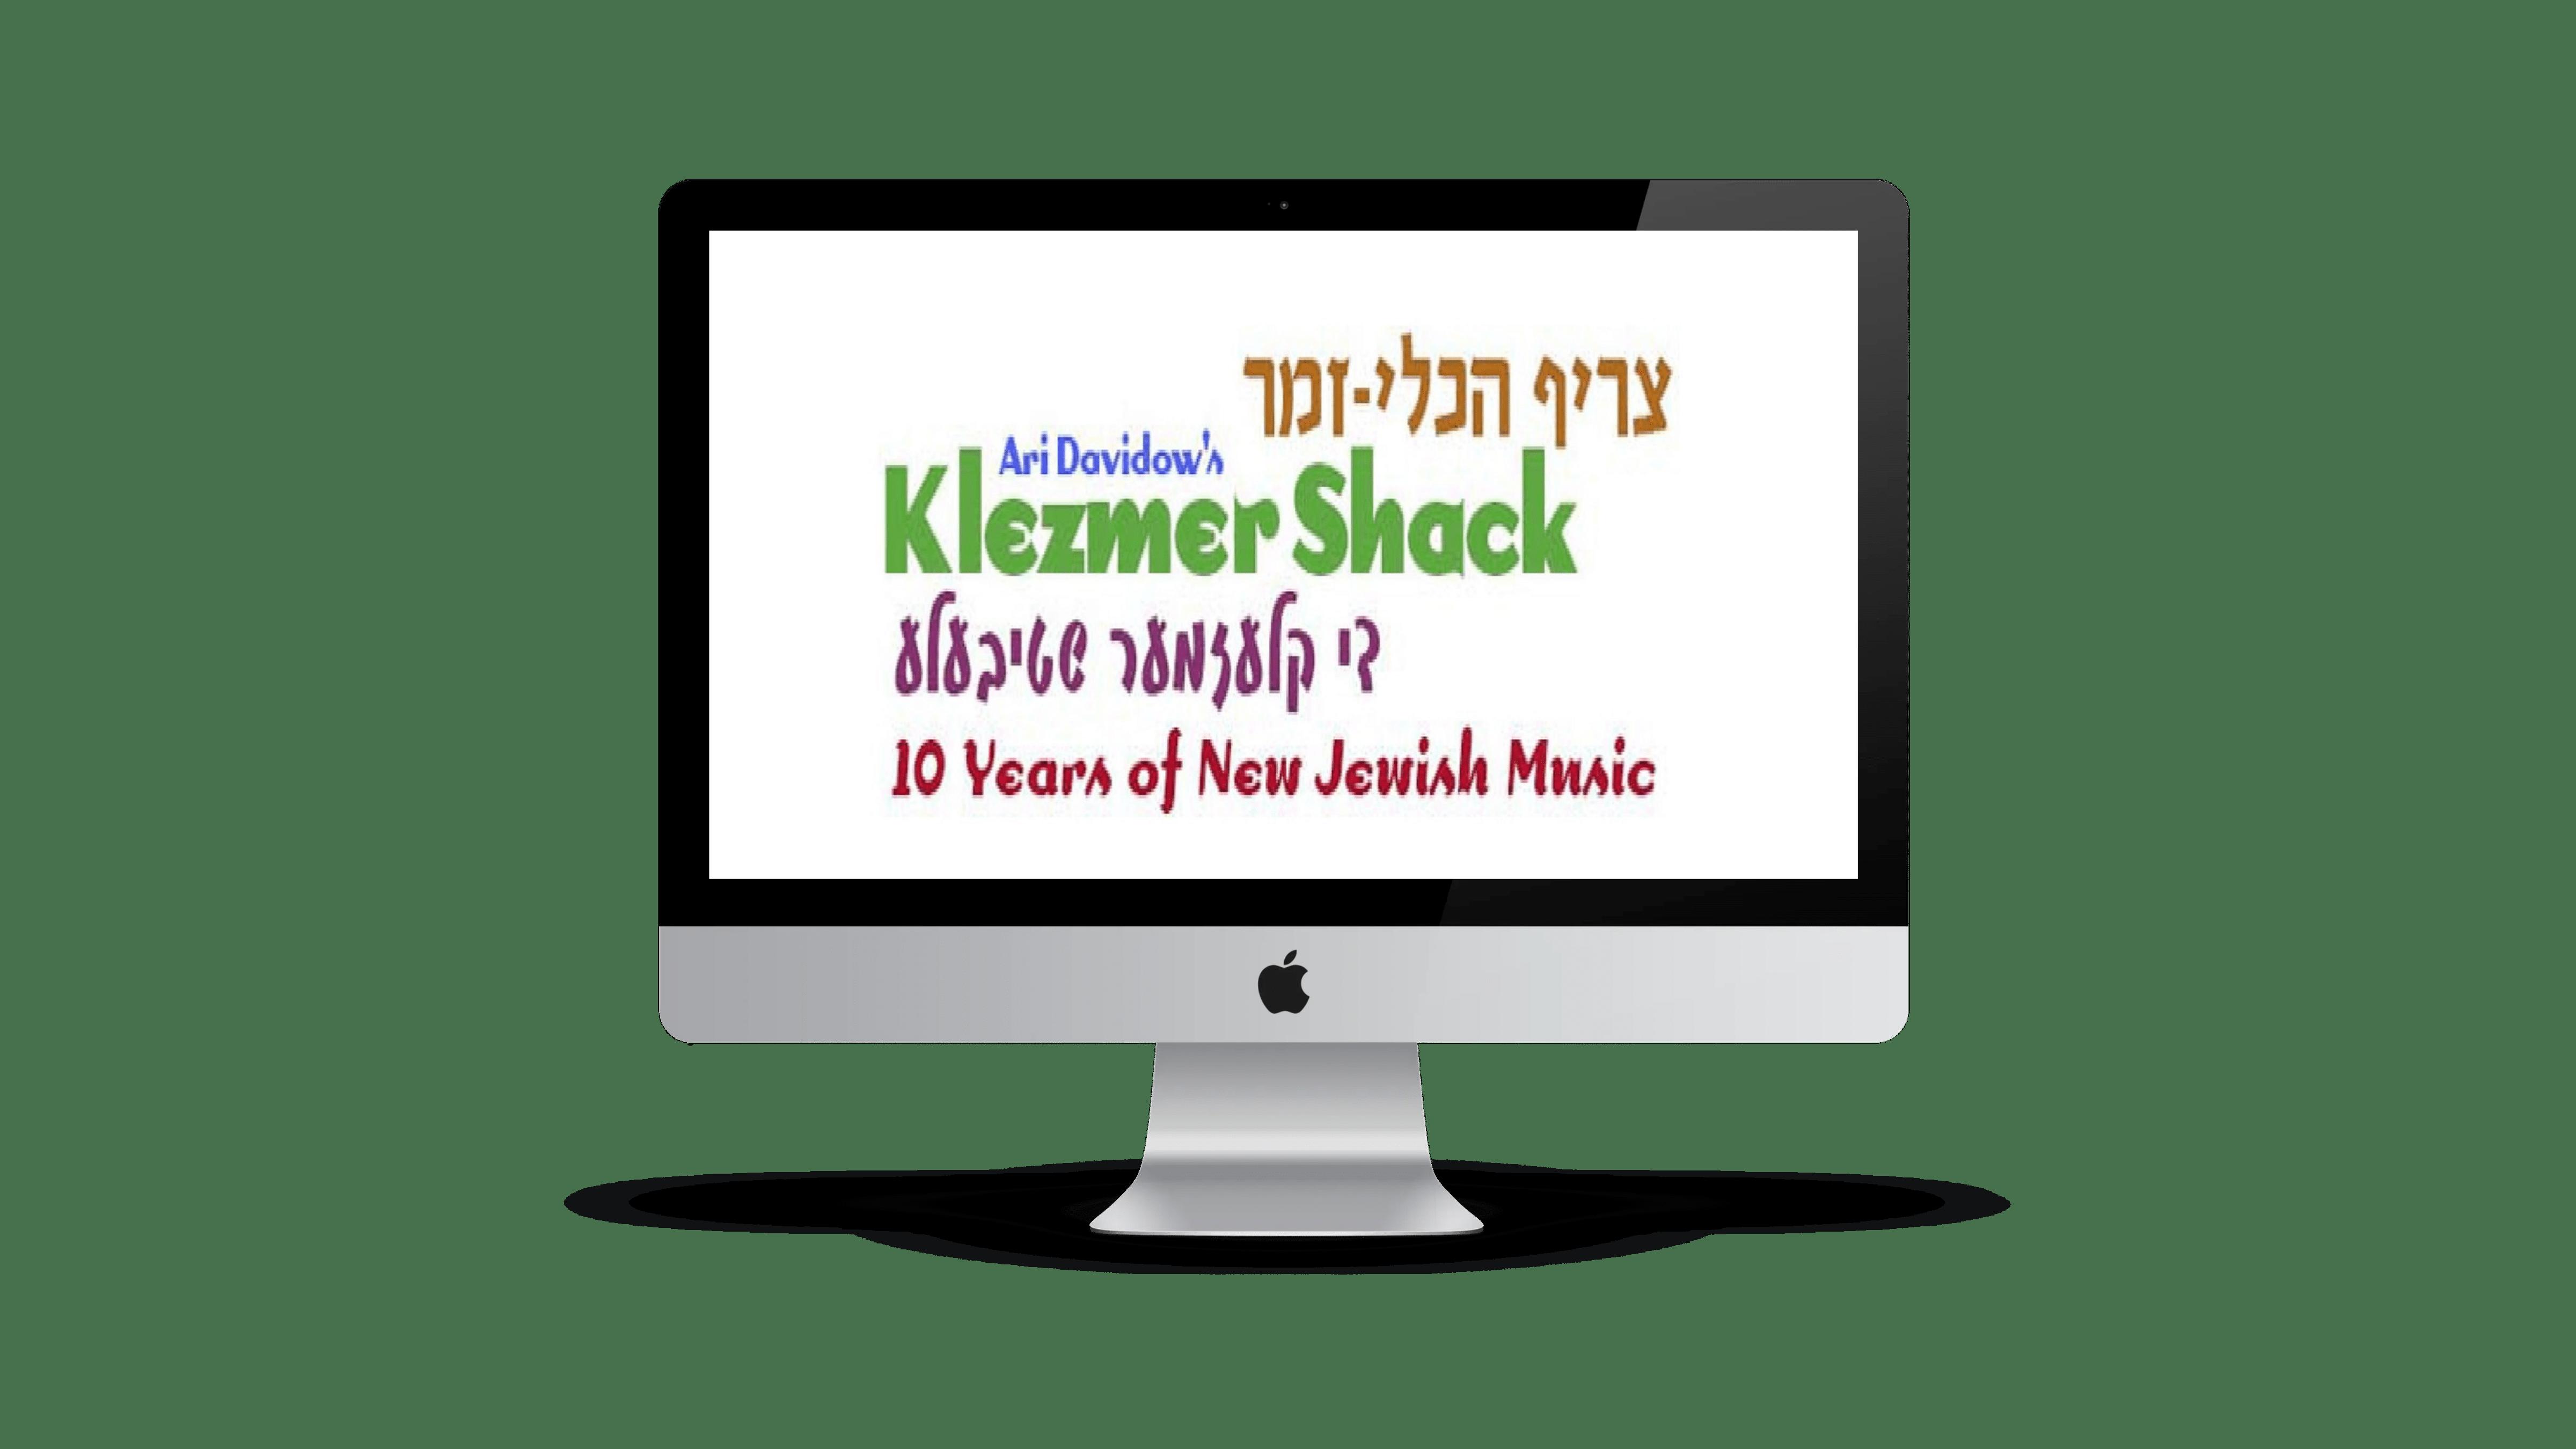 Klezmer Shack Computer